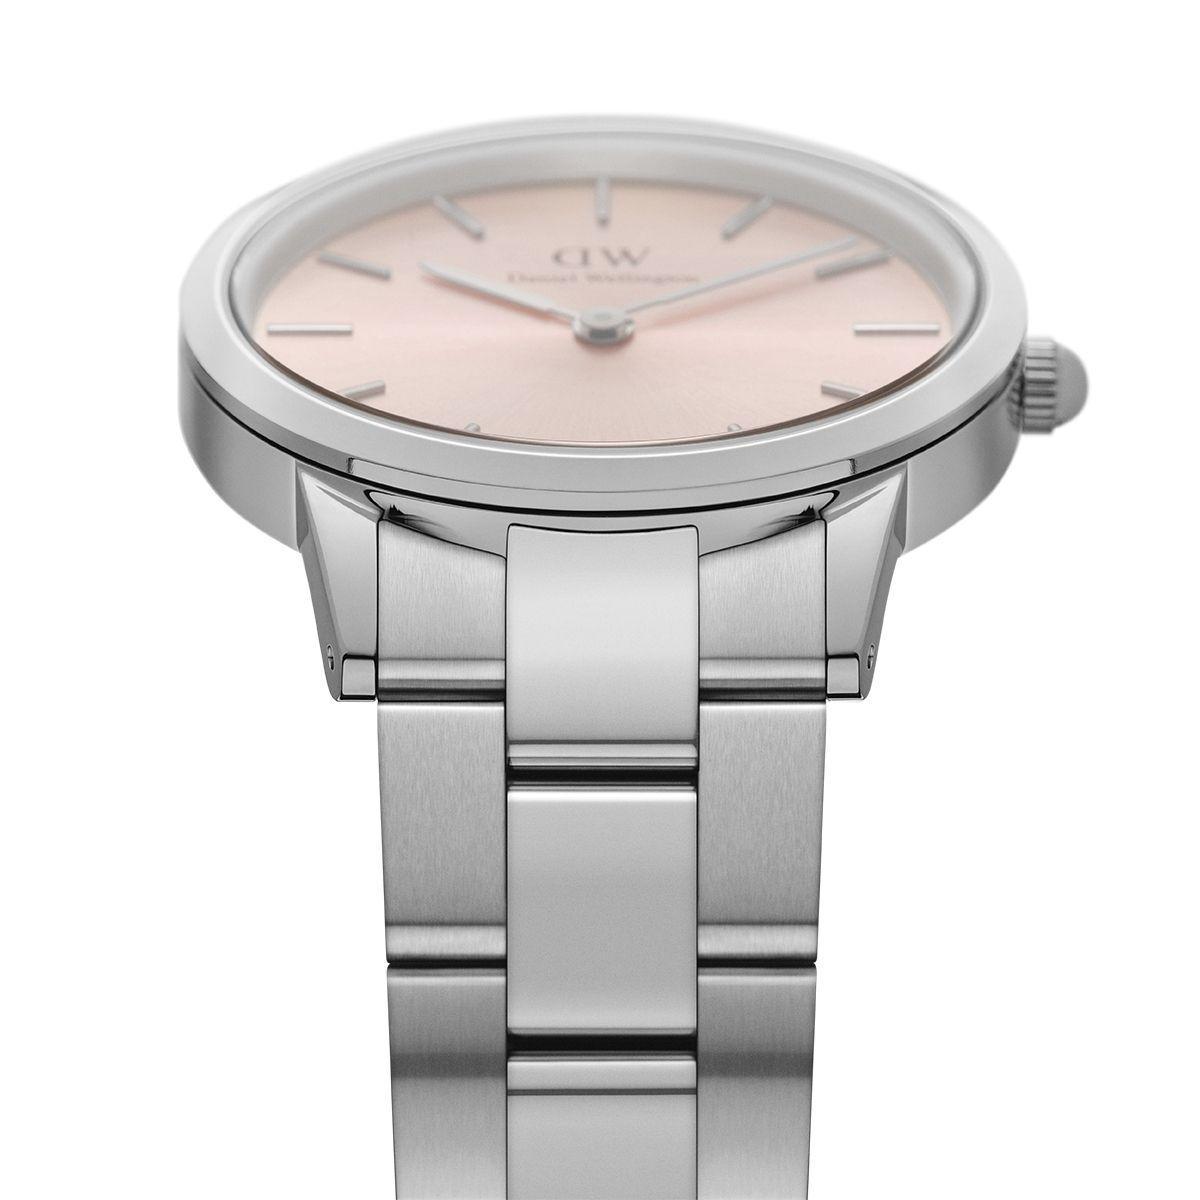 dw官网 dw手表官网 dw中国官网 dw官方旗舰店 DW DW官网  Watch Iconic Link Silver Pink 32mm